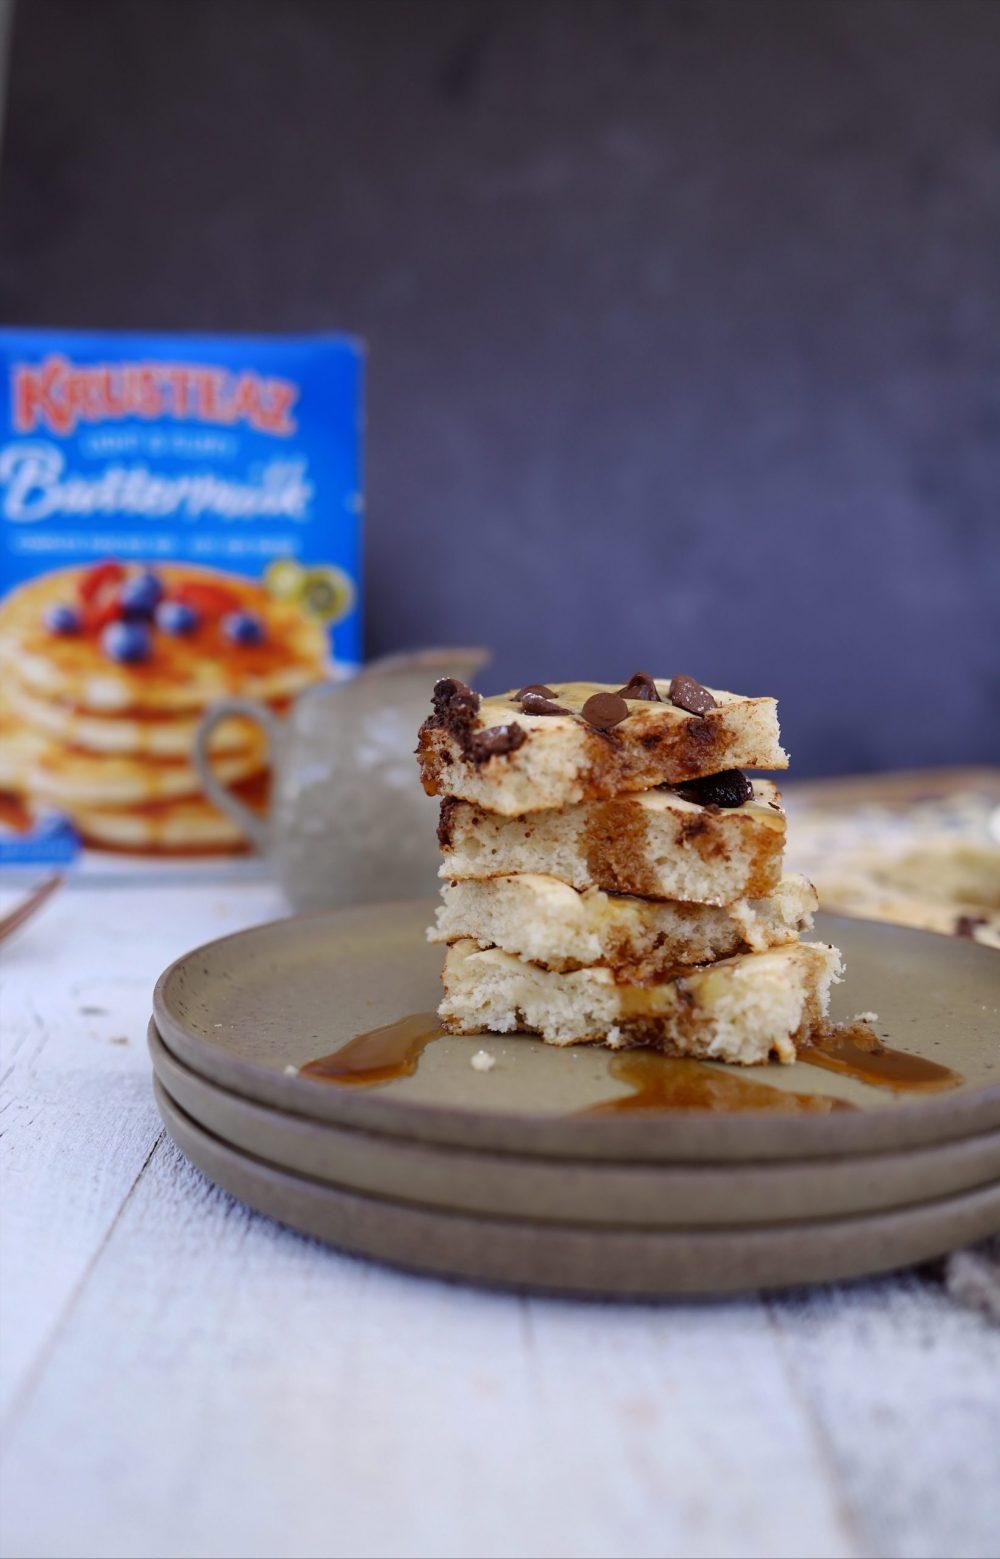 Amazingly Easy Sheet Pan Pancakes With Krusteaz Buttermilk Pancake Mix. Family breakfast ideas with 37 pancake add-in ideas. Big batch breakfast with baked pancakes to feed a crowd. |Krusteaz Buttermilk Pancake Mix by popular Florida lifestyle blog, Fresh Mommy: image of stacked sheet pan pancake slices.